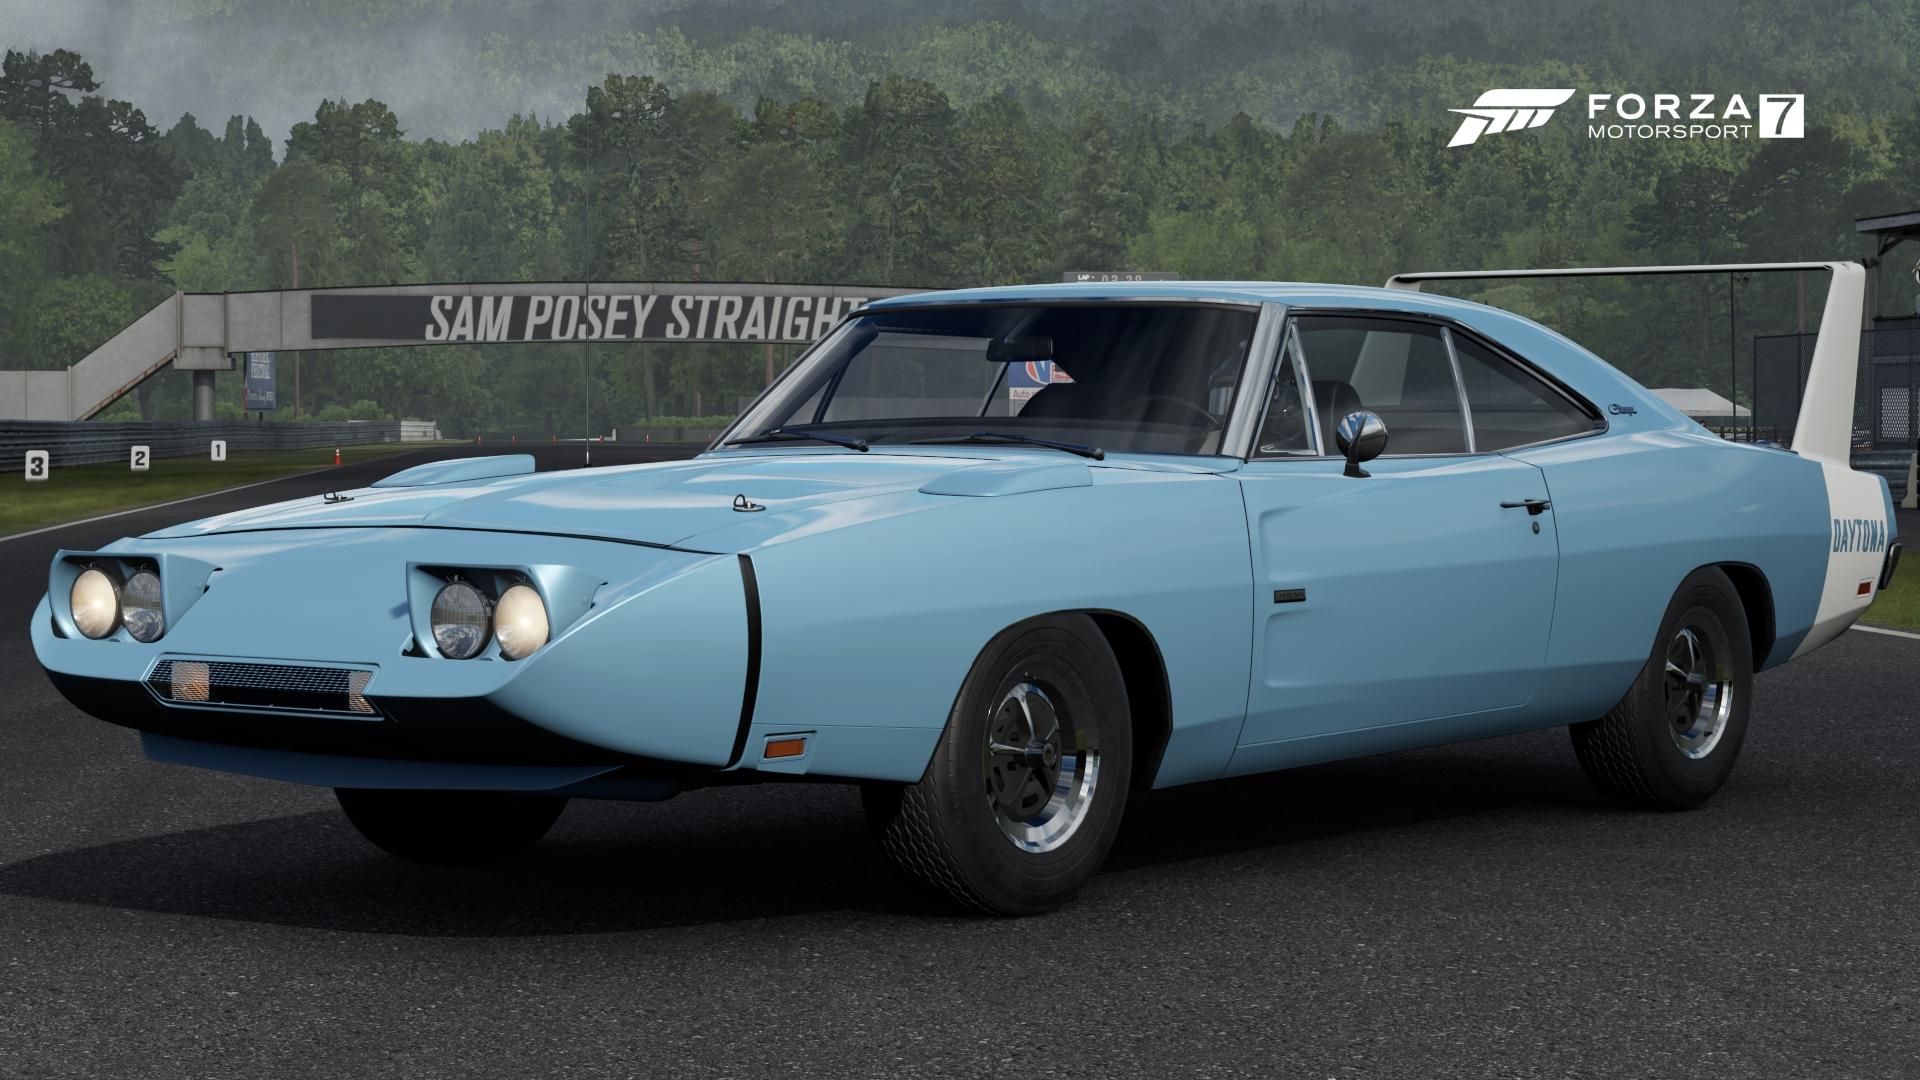 Dodge Charger Daytona Hemi Forza Motorsport Wiki